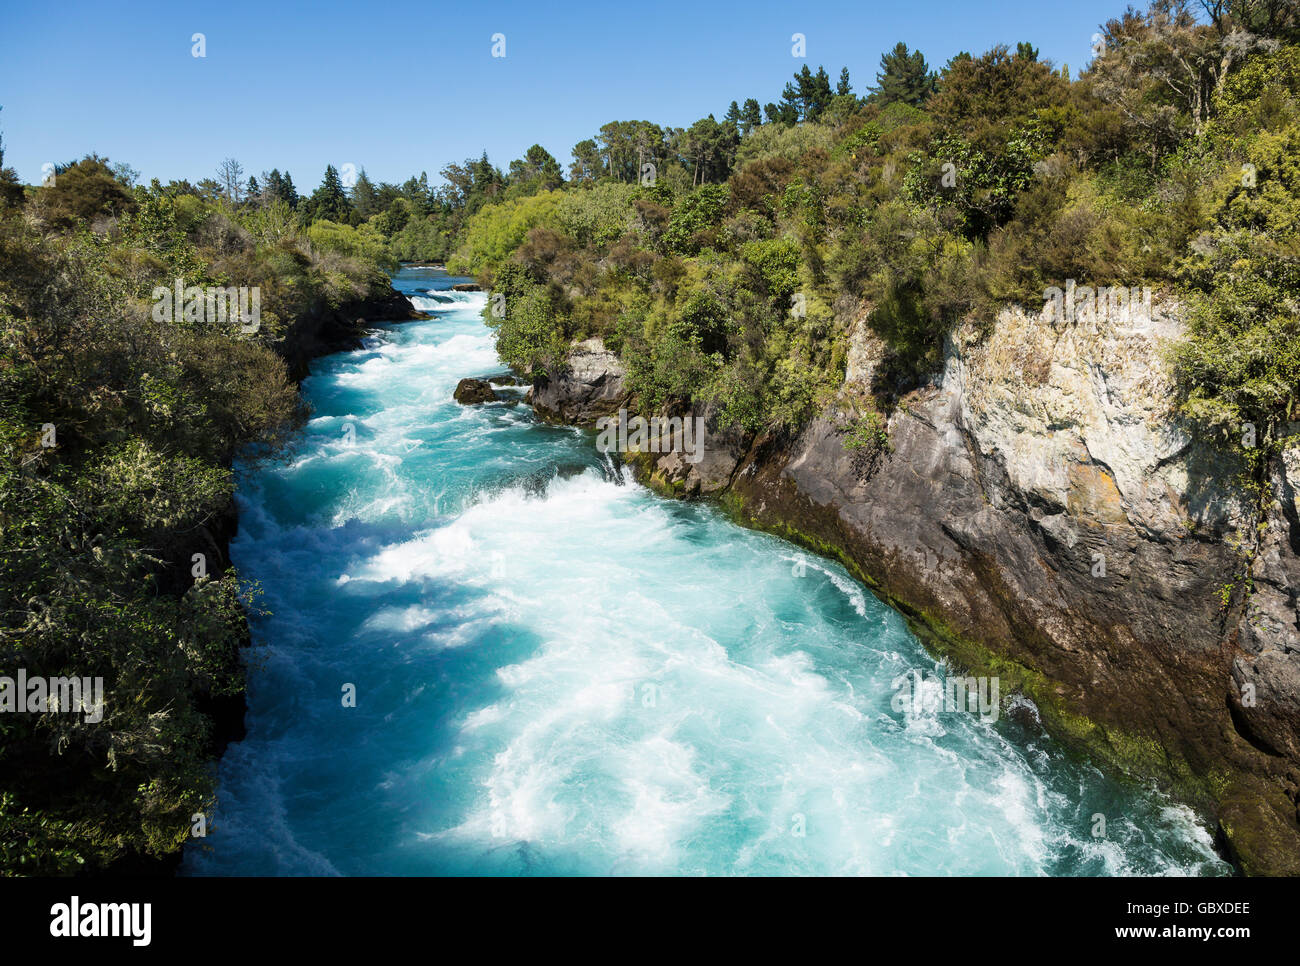 Hukafalls on Waikato River, Taupo, New Zealand - Stock Image